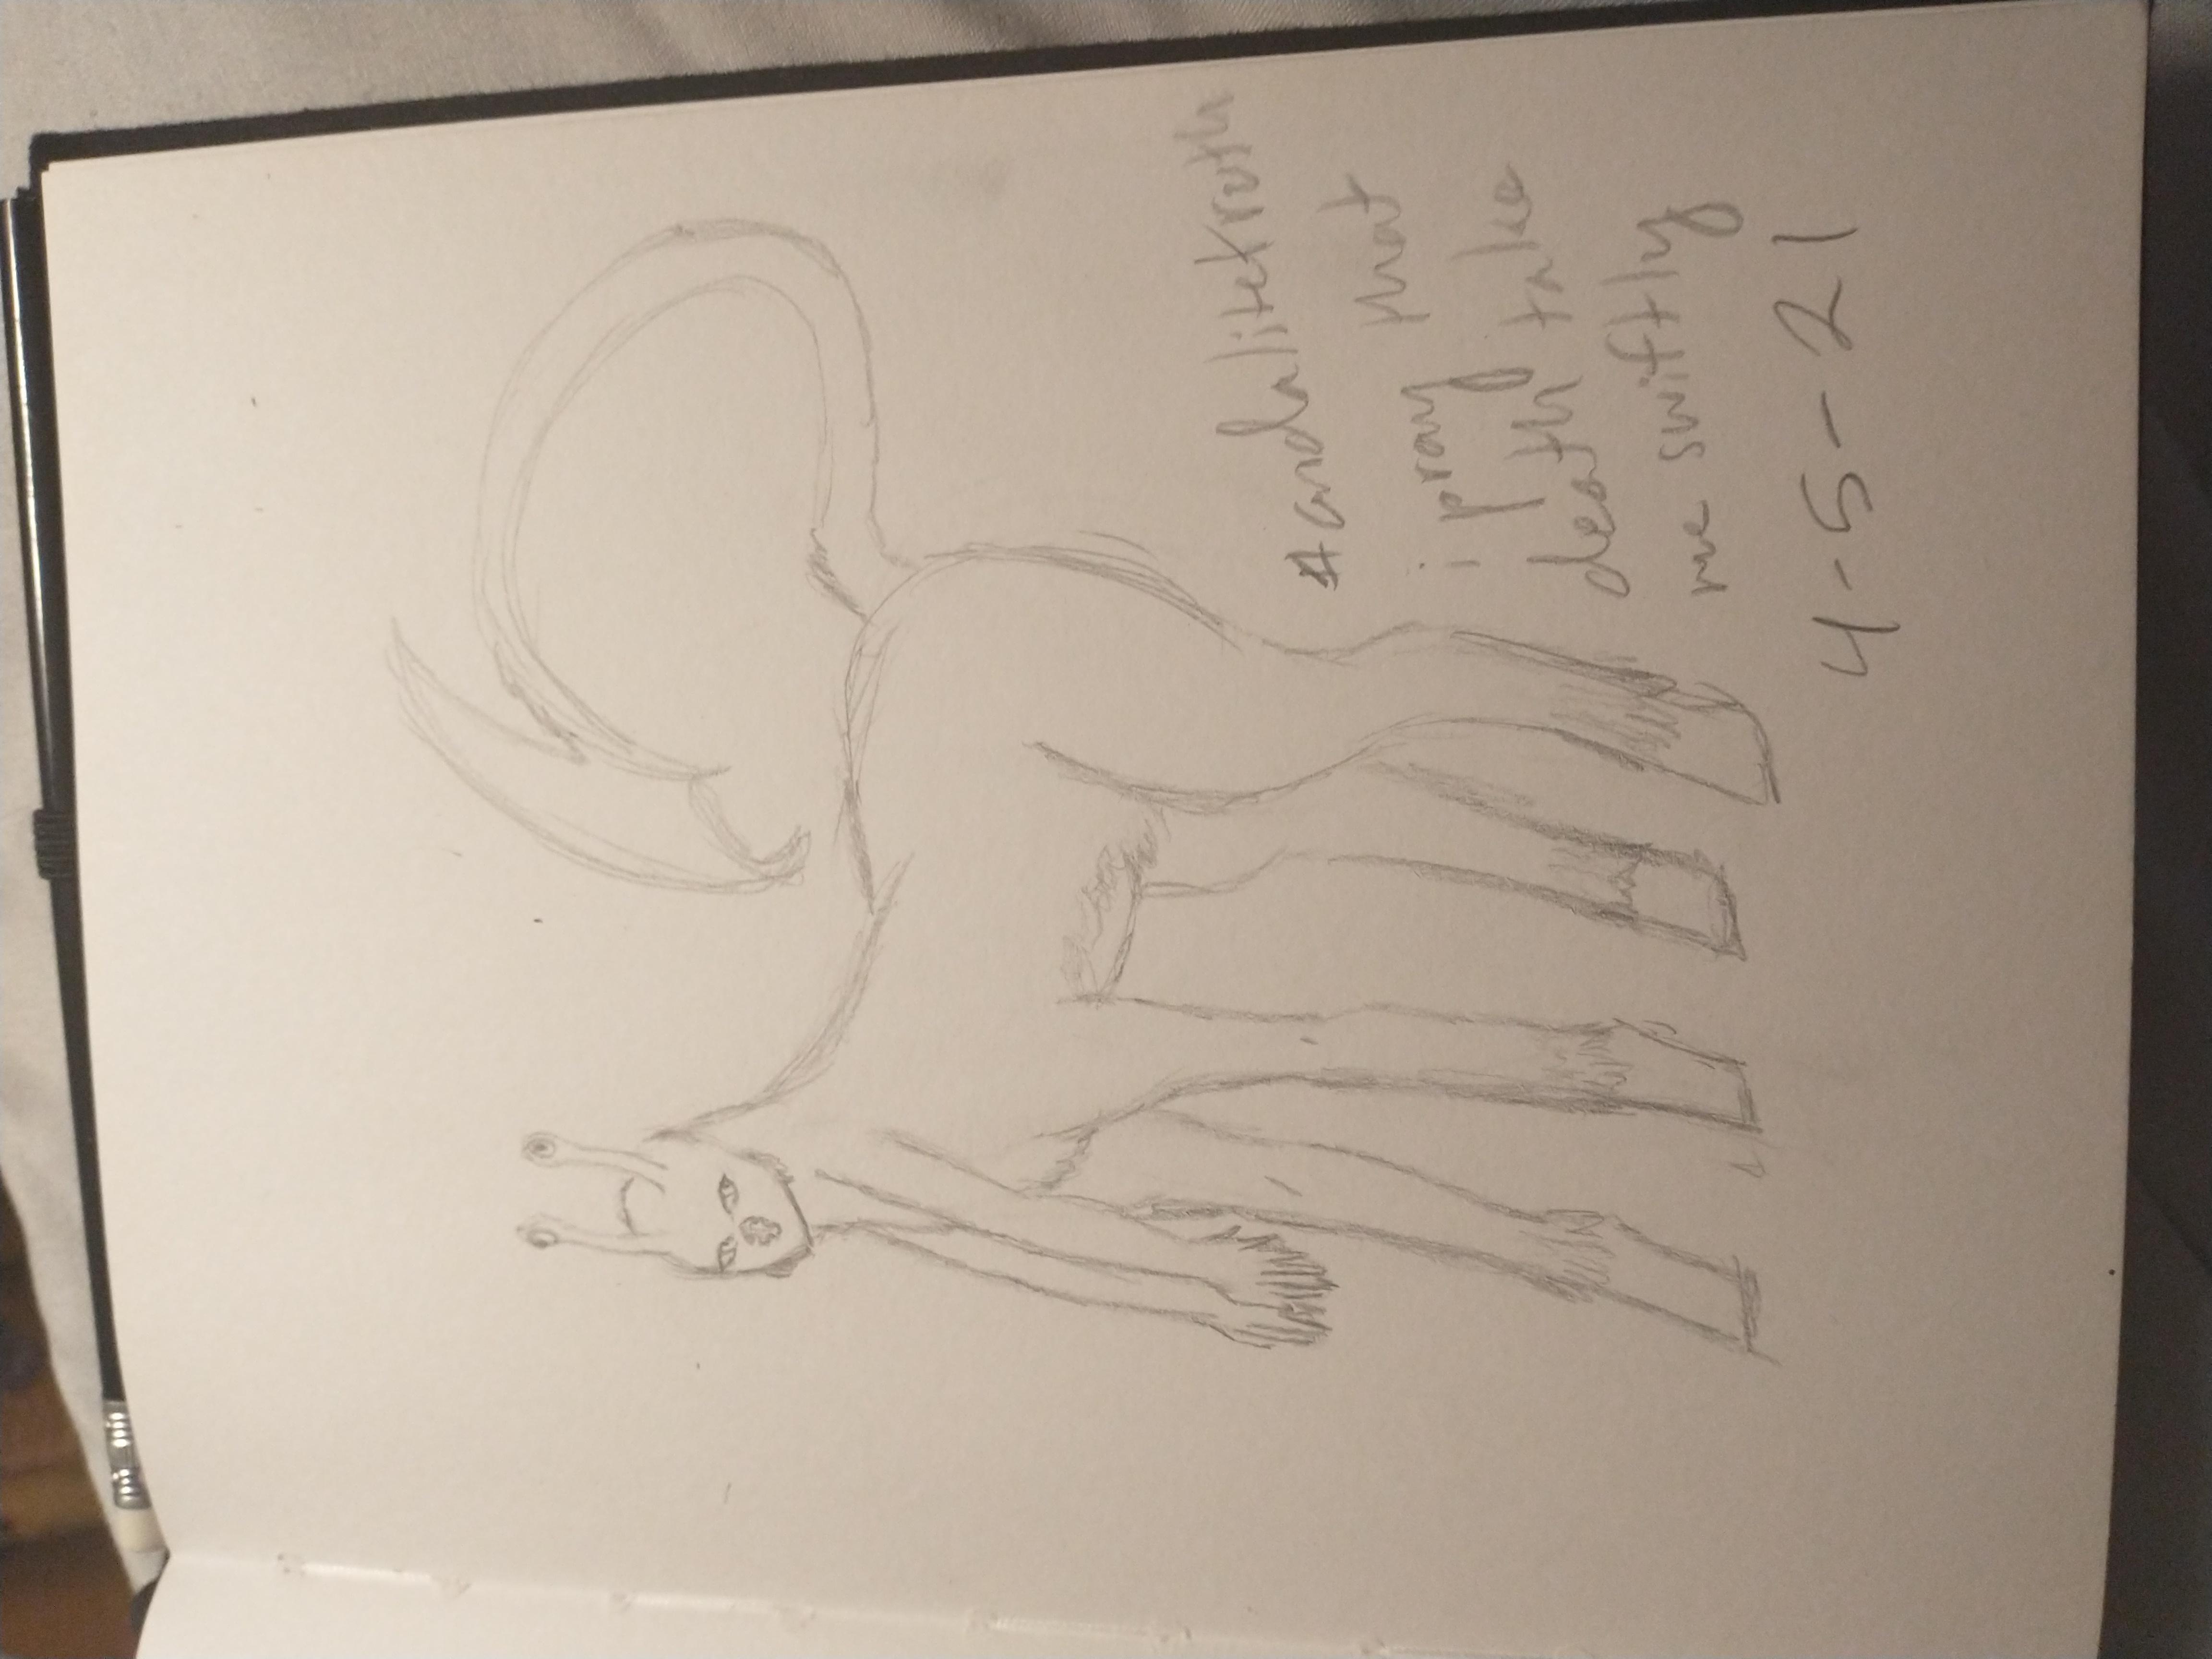 Andalite sketch by Ann